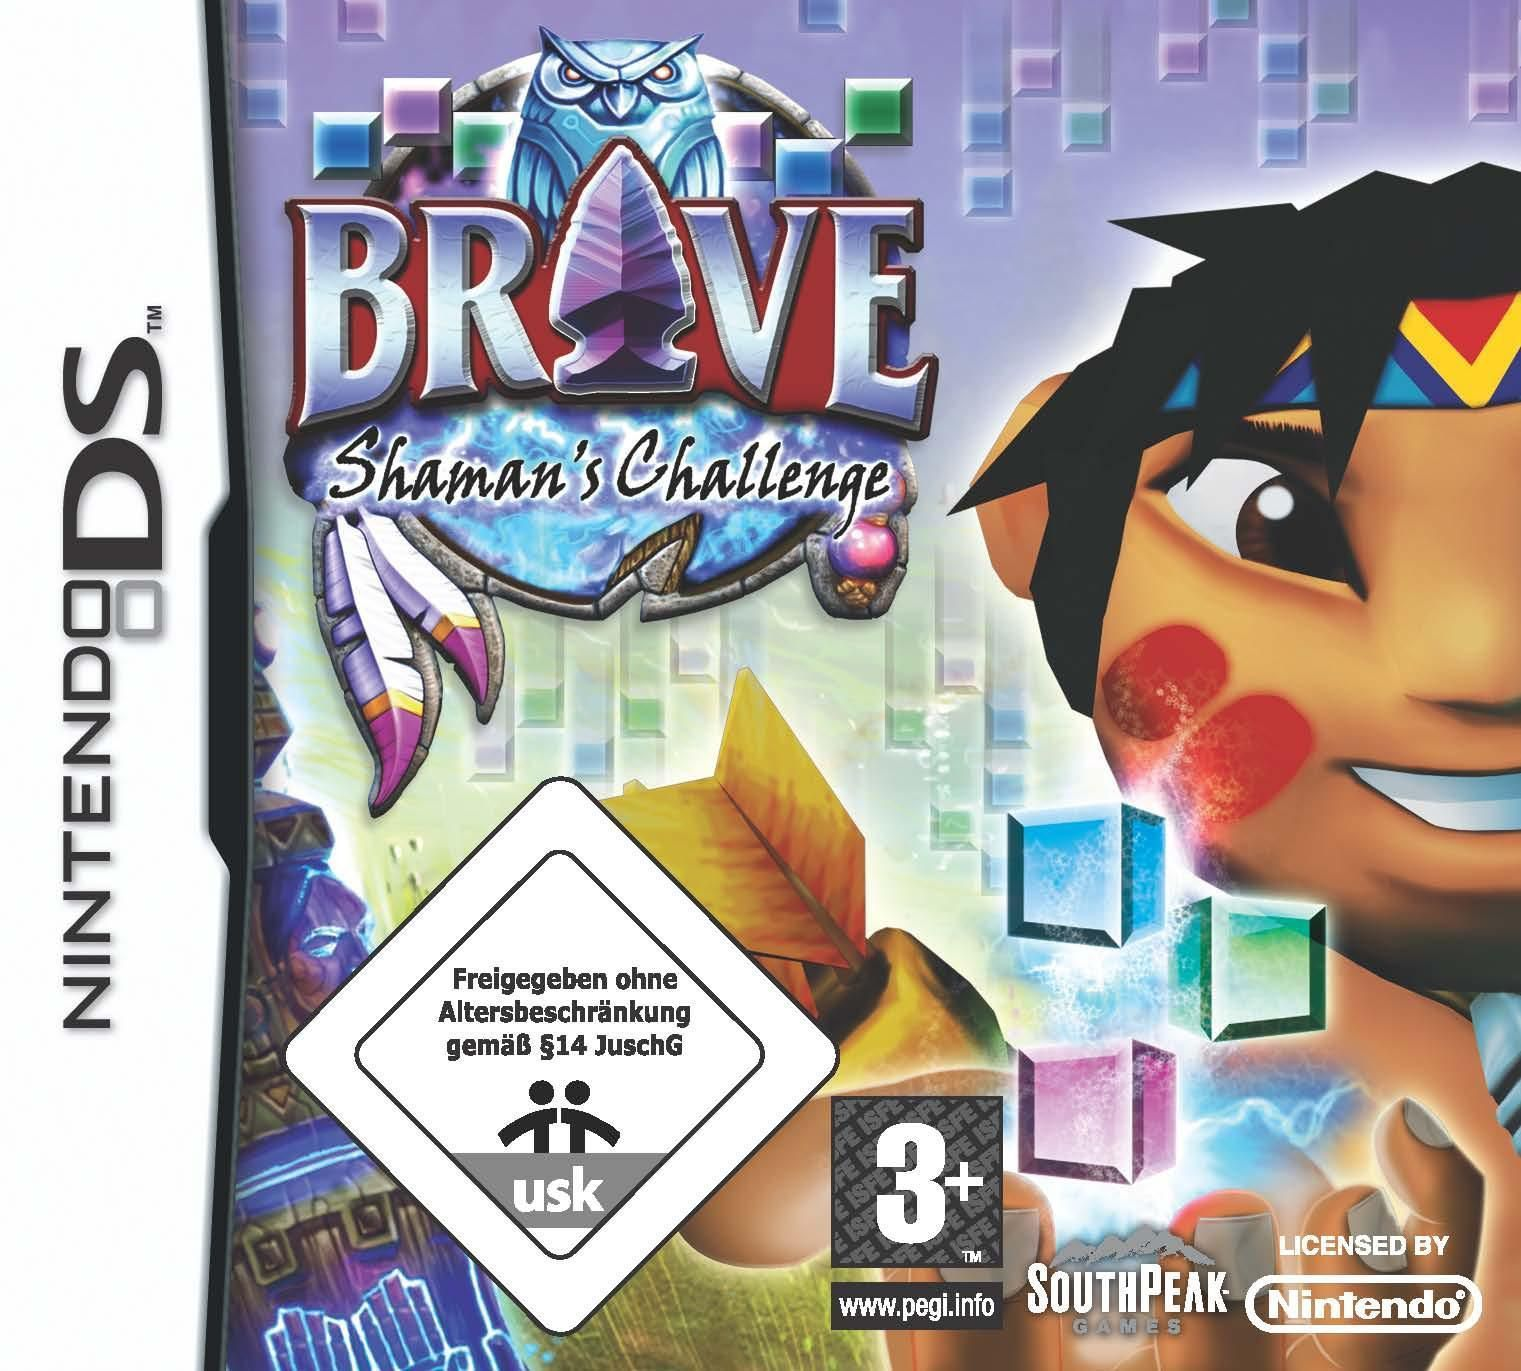 6112 - Brave (ABSTRAKT)